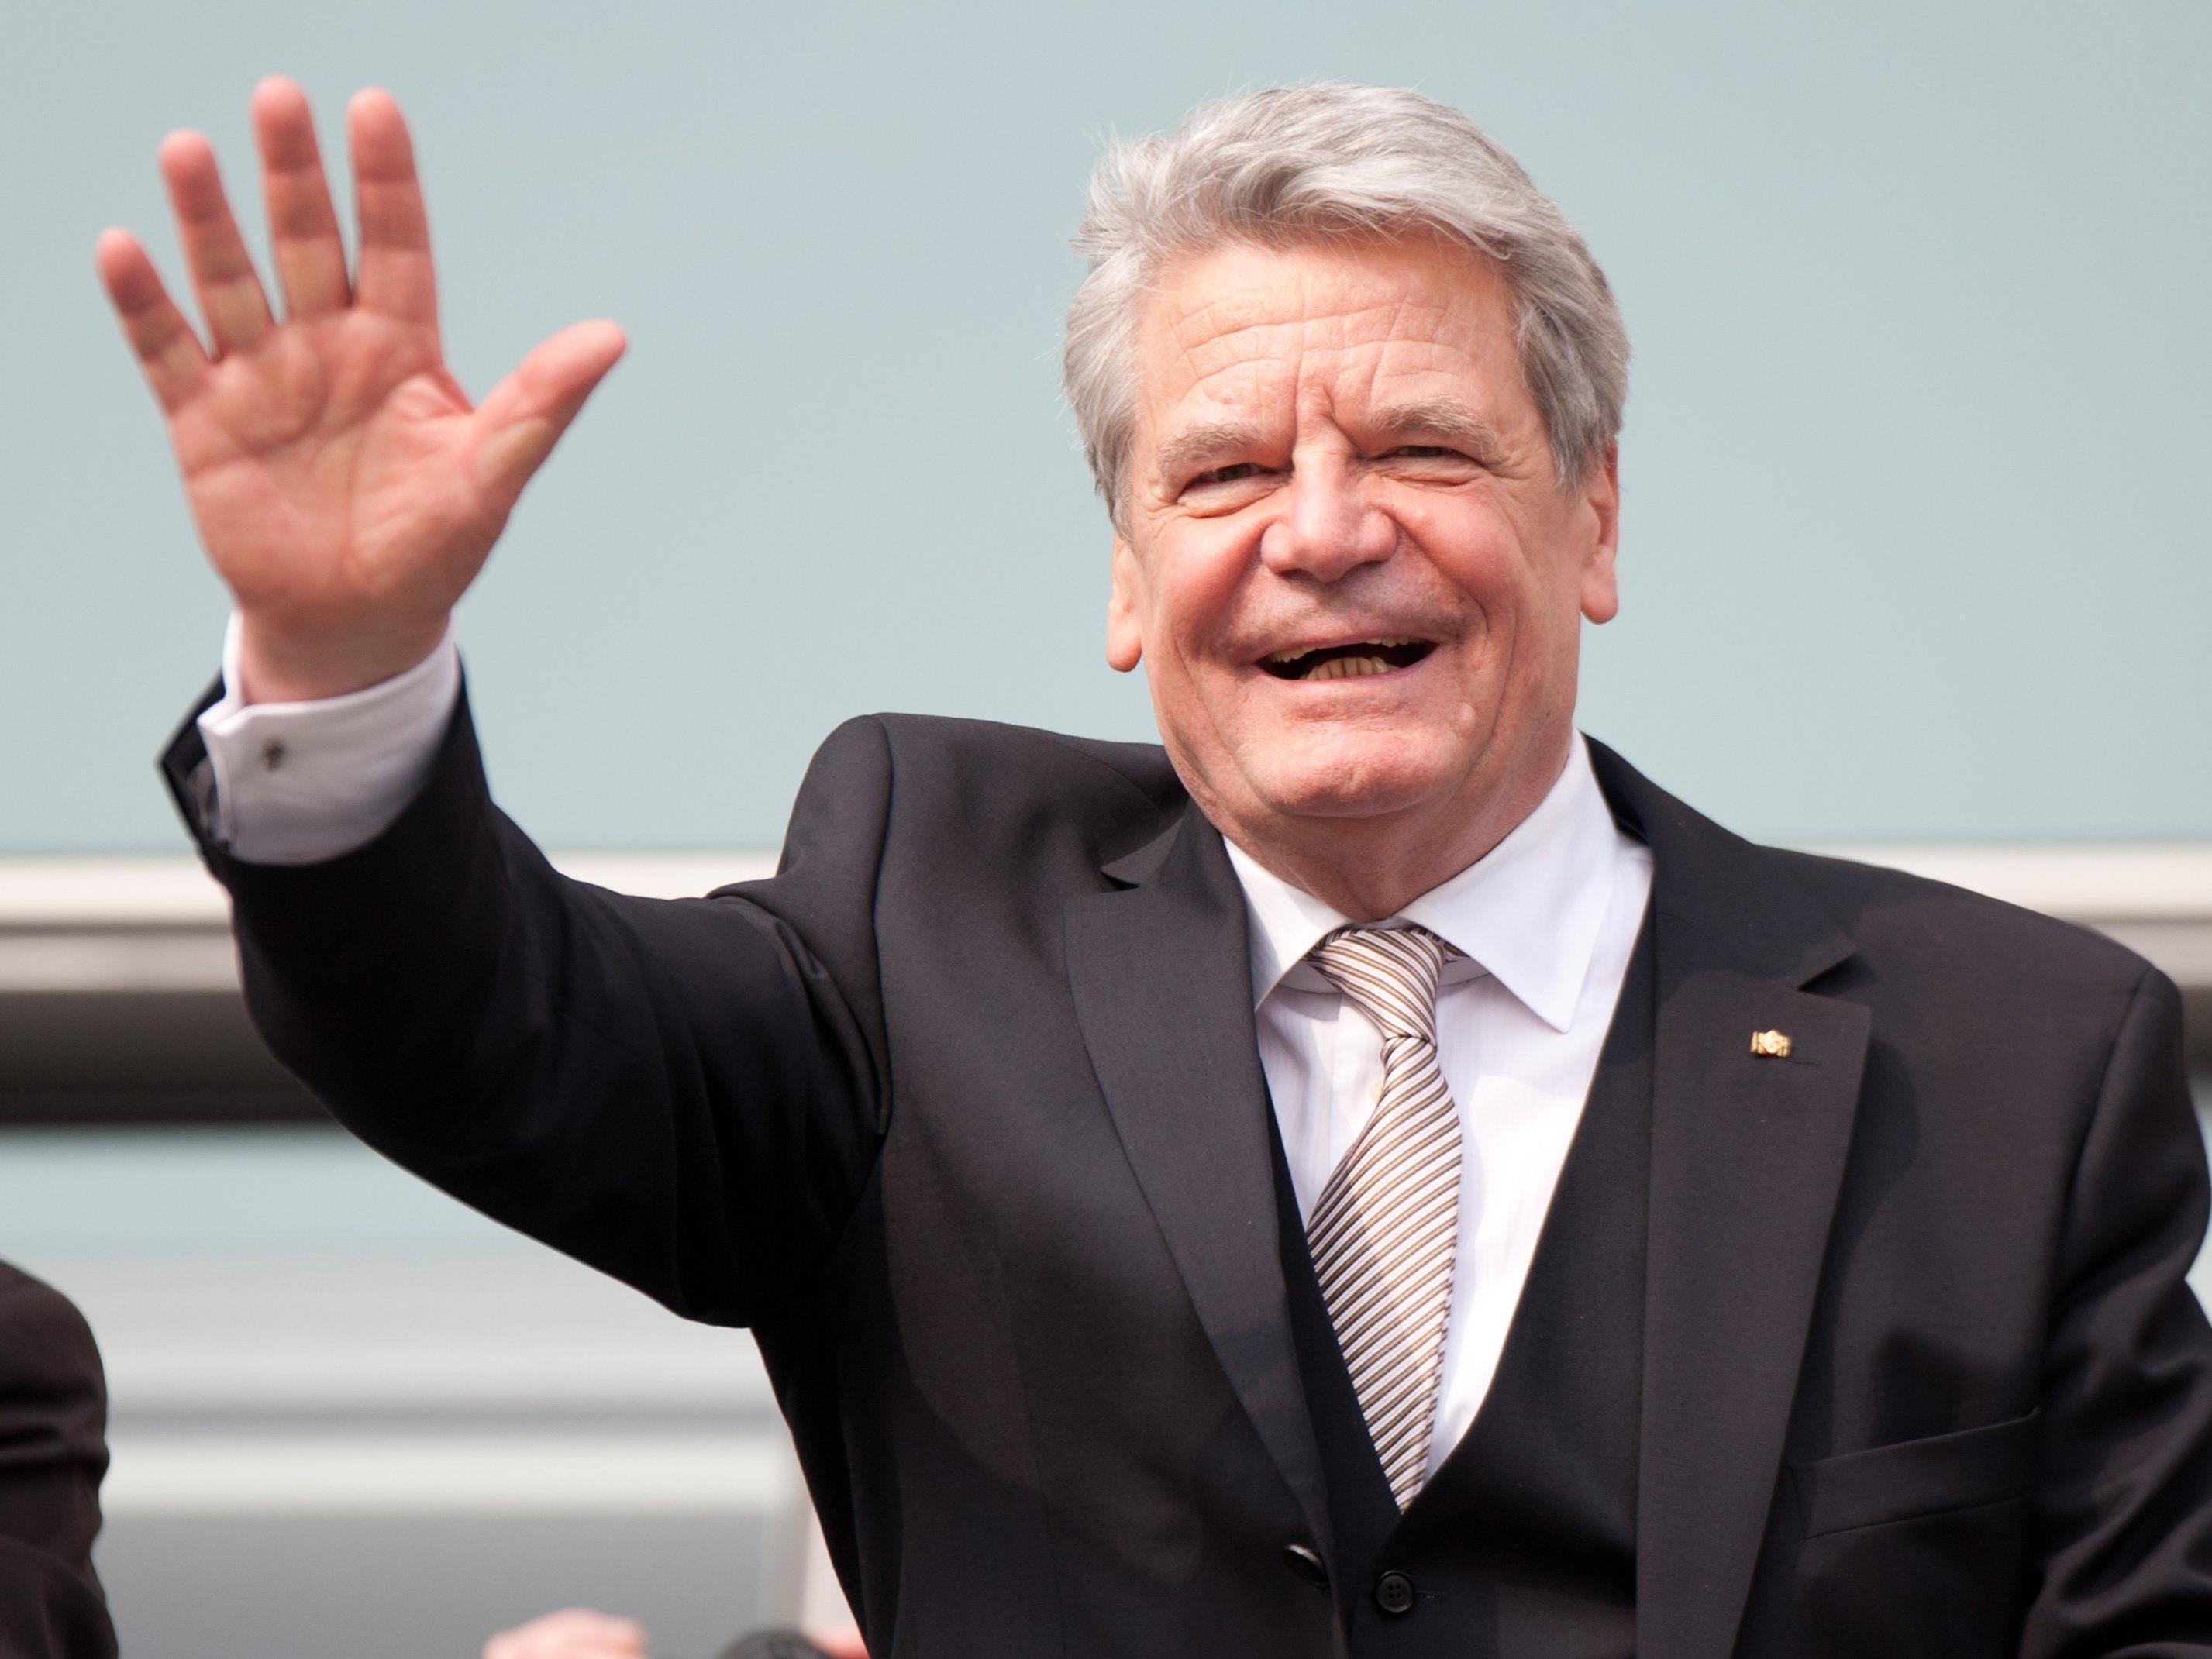 Gauks Gegenkandidatin Klarsfeld kam auf 126 Stimmen.